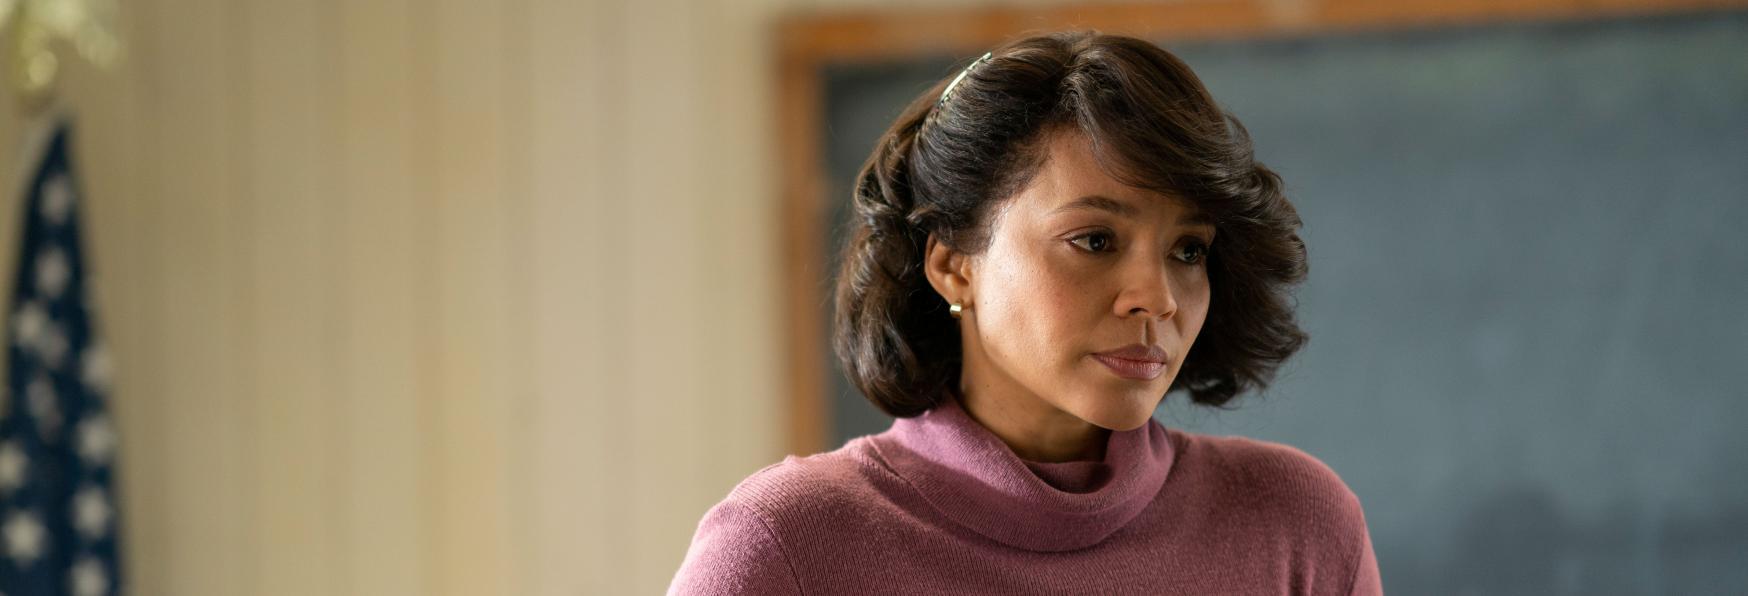 Secret Invasion: Carmen Ejogo (True Detective) sarà nel Cast dell'attesa Serie TV Marvel?